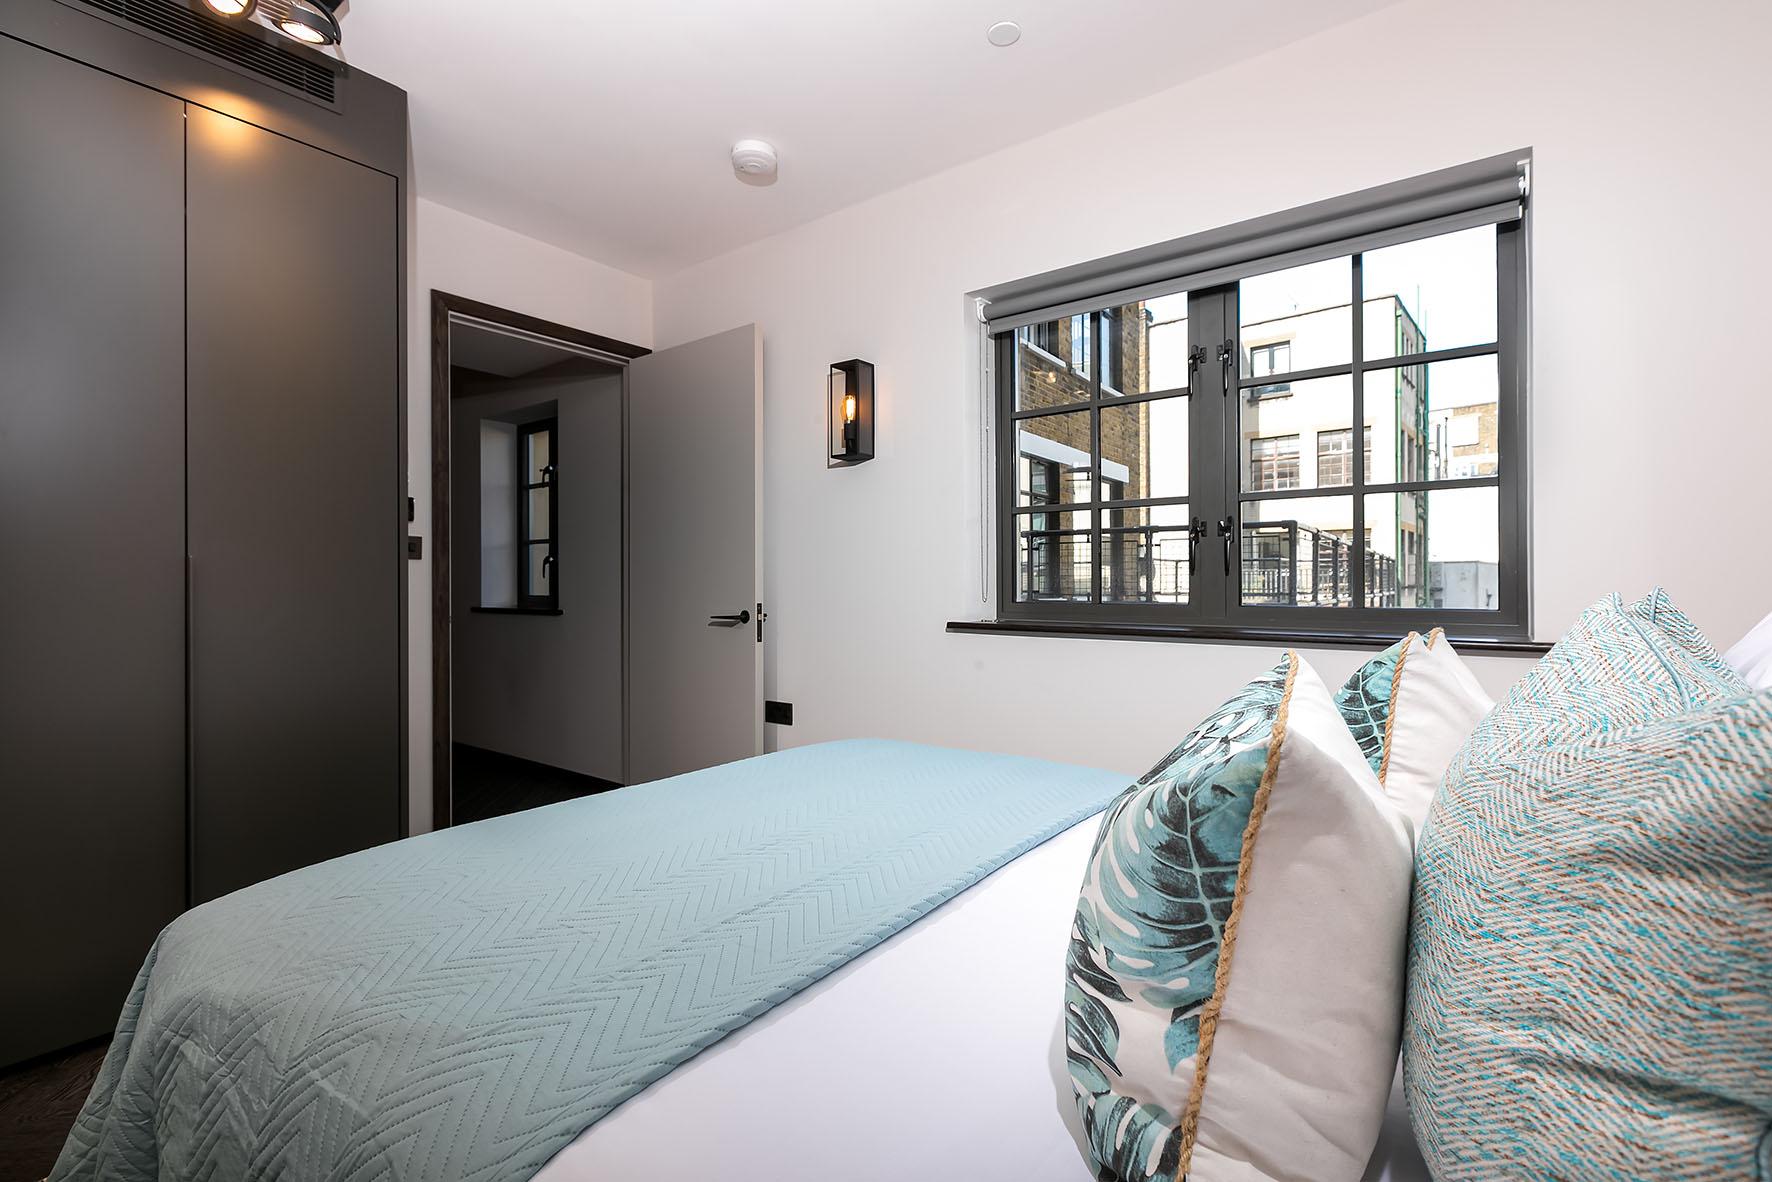 Lovelydays luxury service apartment rental - London - Soho - Oxford Street V - Lovelysuite - 1 bedrooms - 1 bathrooms - Queen bed - 5afeb45a1706 - Lovelydays